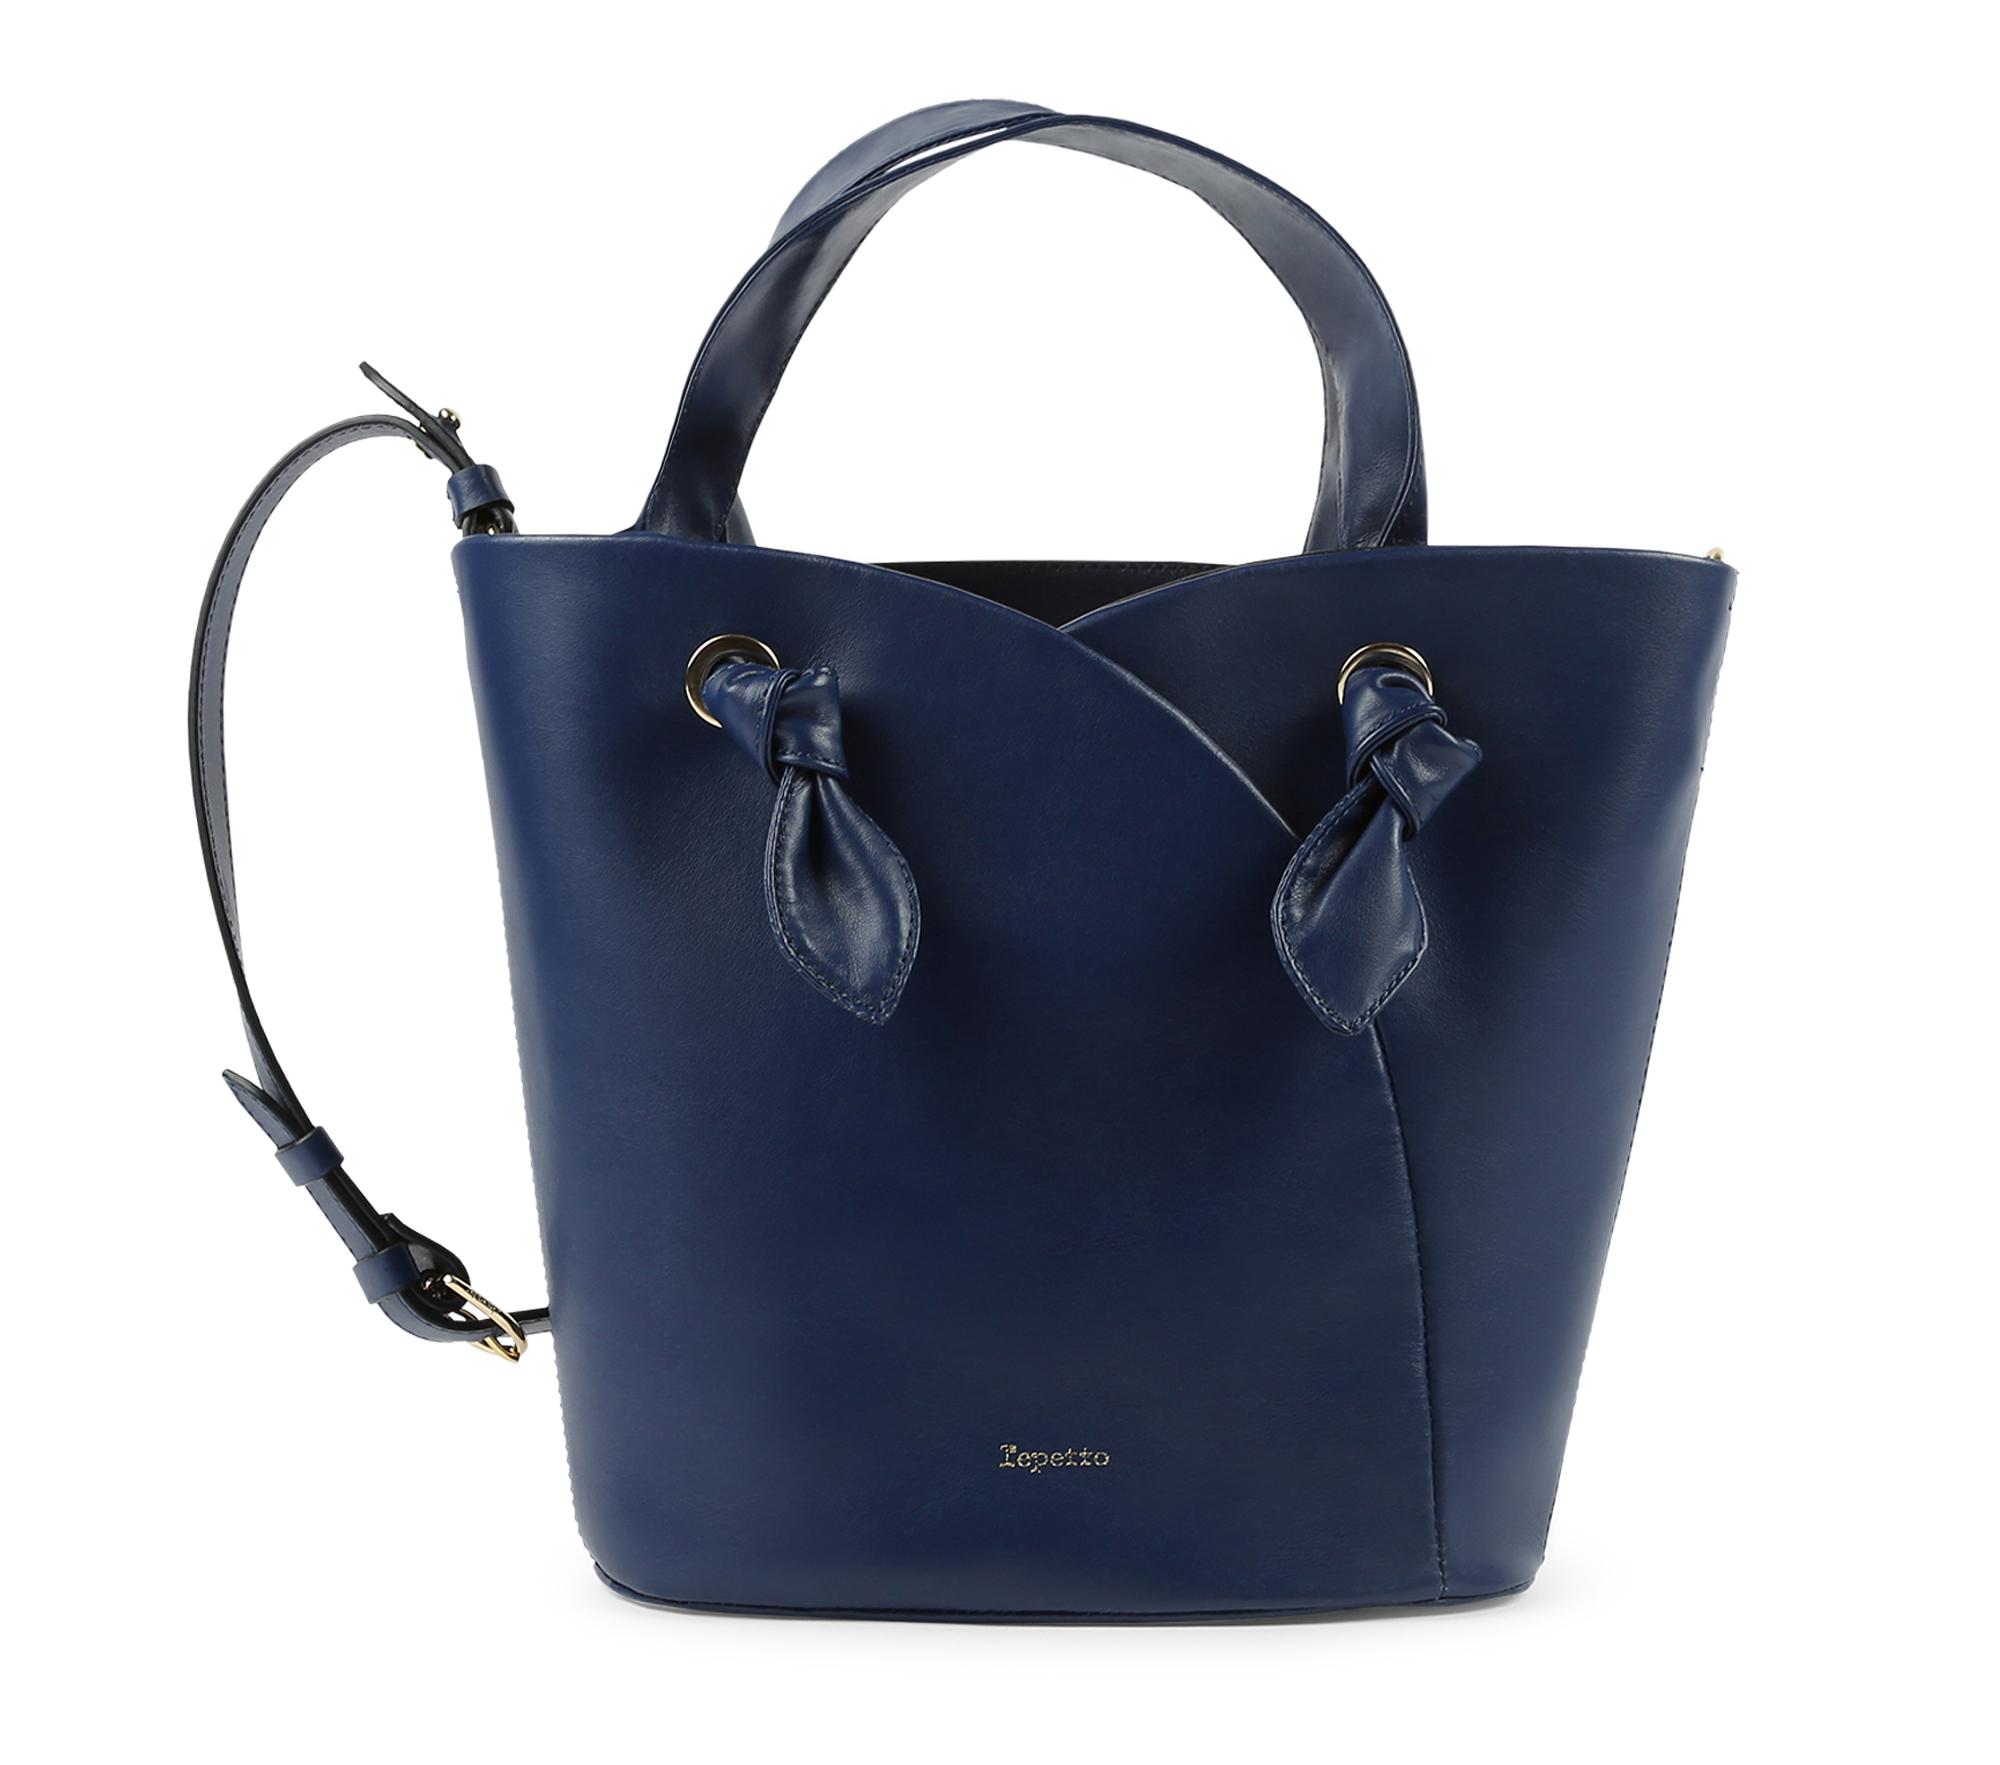 Révérence bag Large size